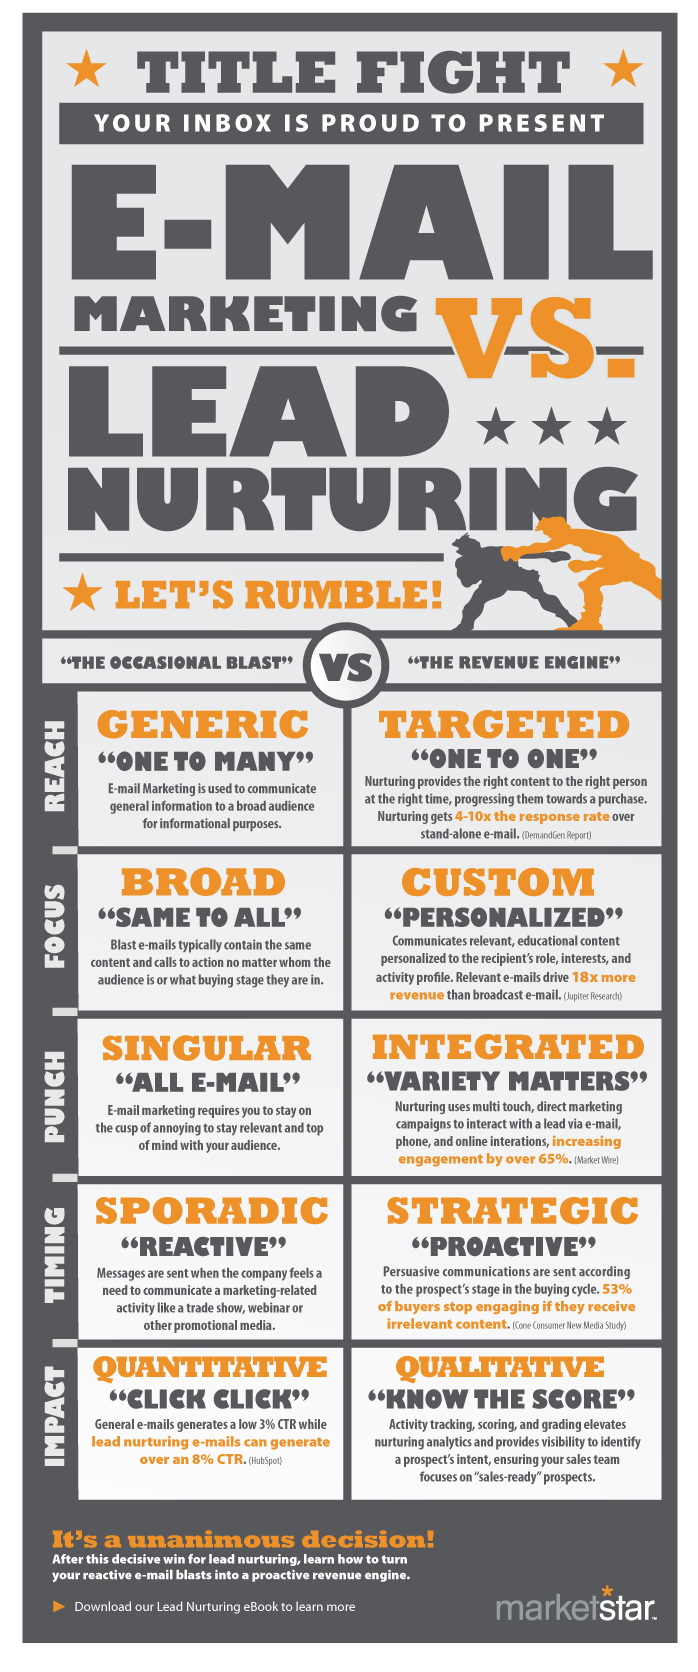 email-marketing-vs-lead-nurturing_50300e4d89a0b